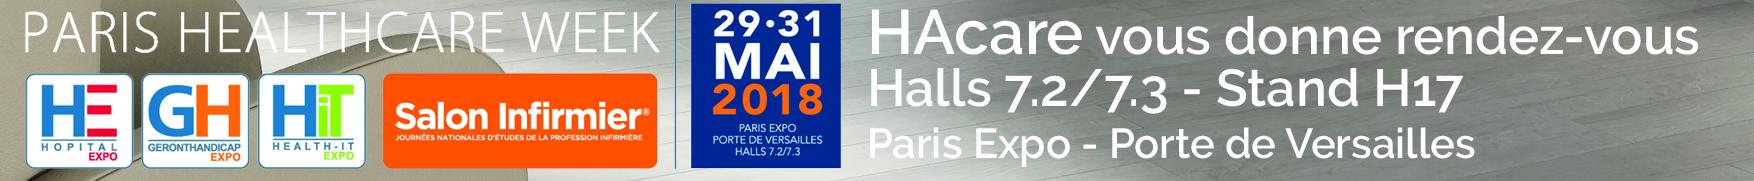 Salon Paris Healthcare Week 2018